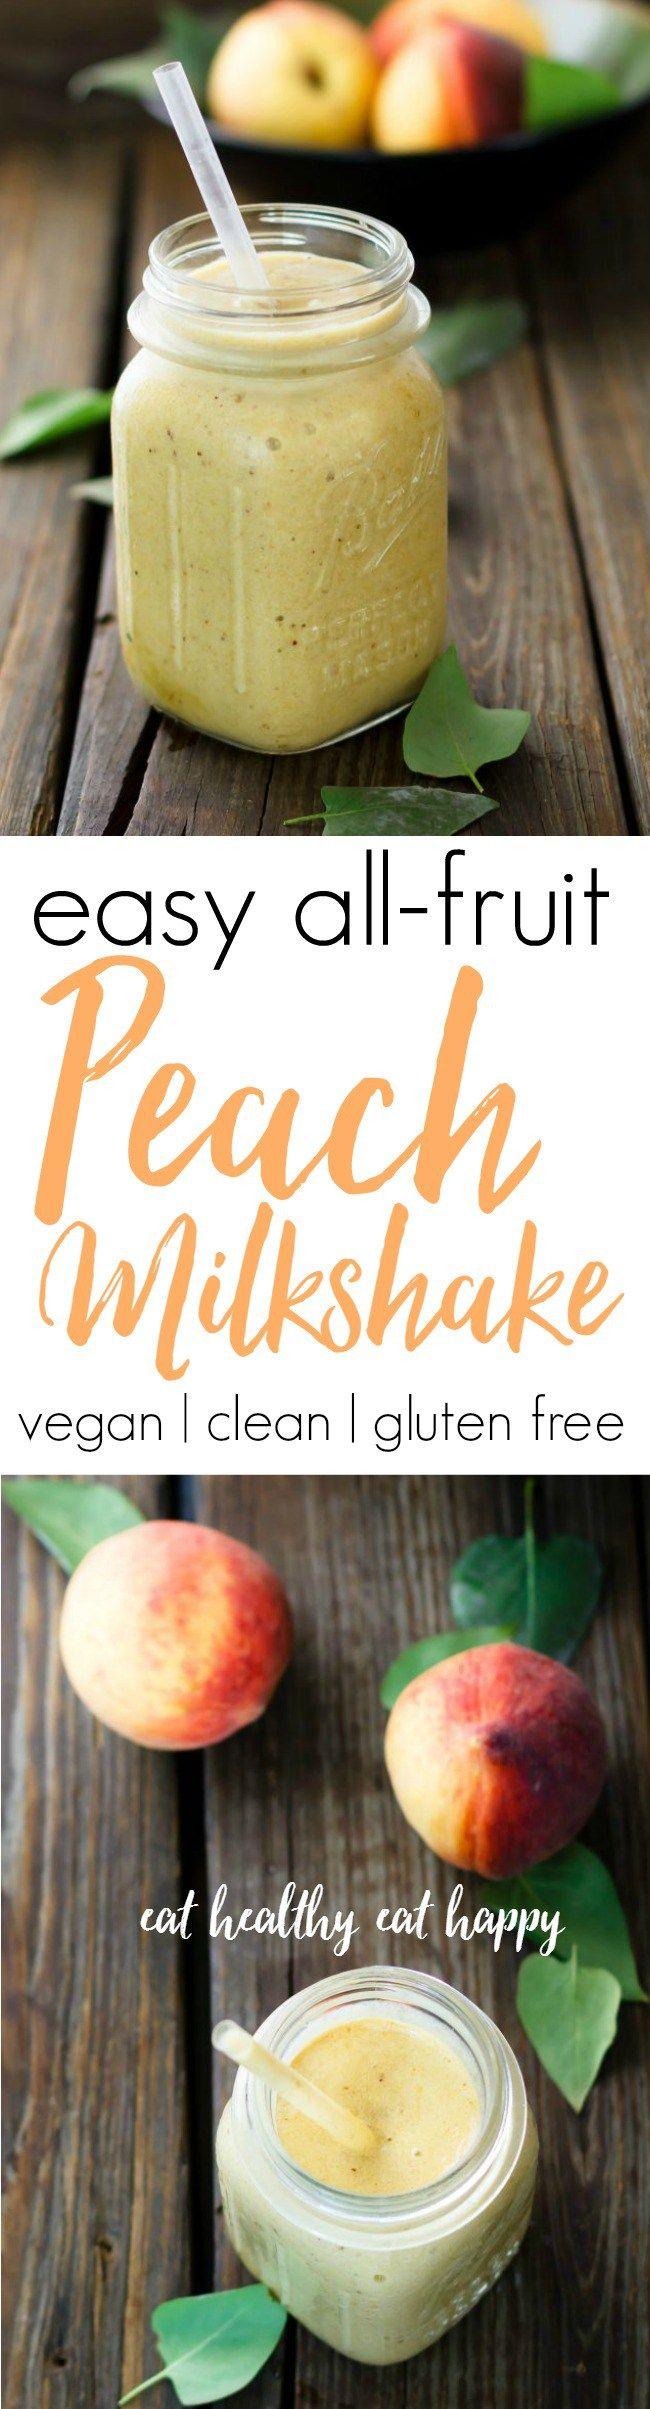 This peach milkshake tastes like an ice cream shake, but it's made from frozen fruit! Vegan, clean, gluten free.